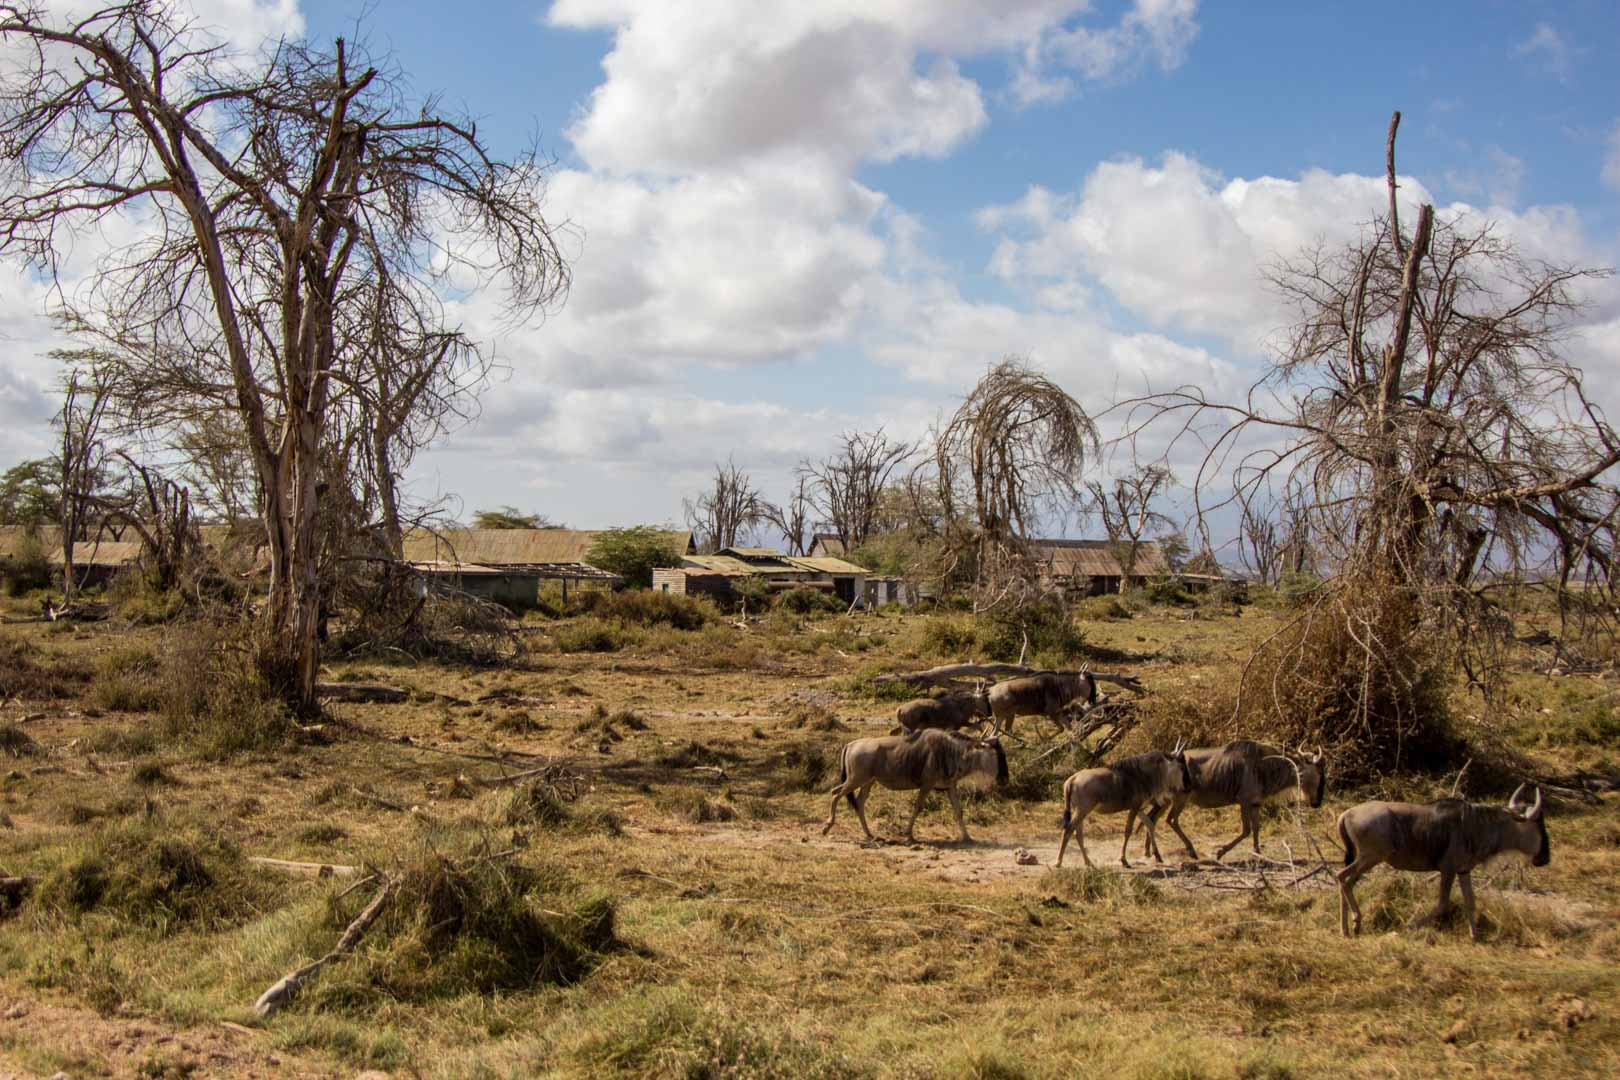 Ñus en un hotel abandonado, Amboseli, Kenia